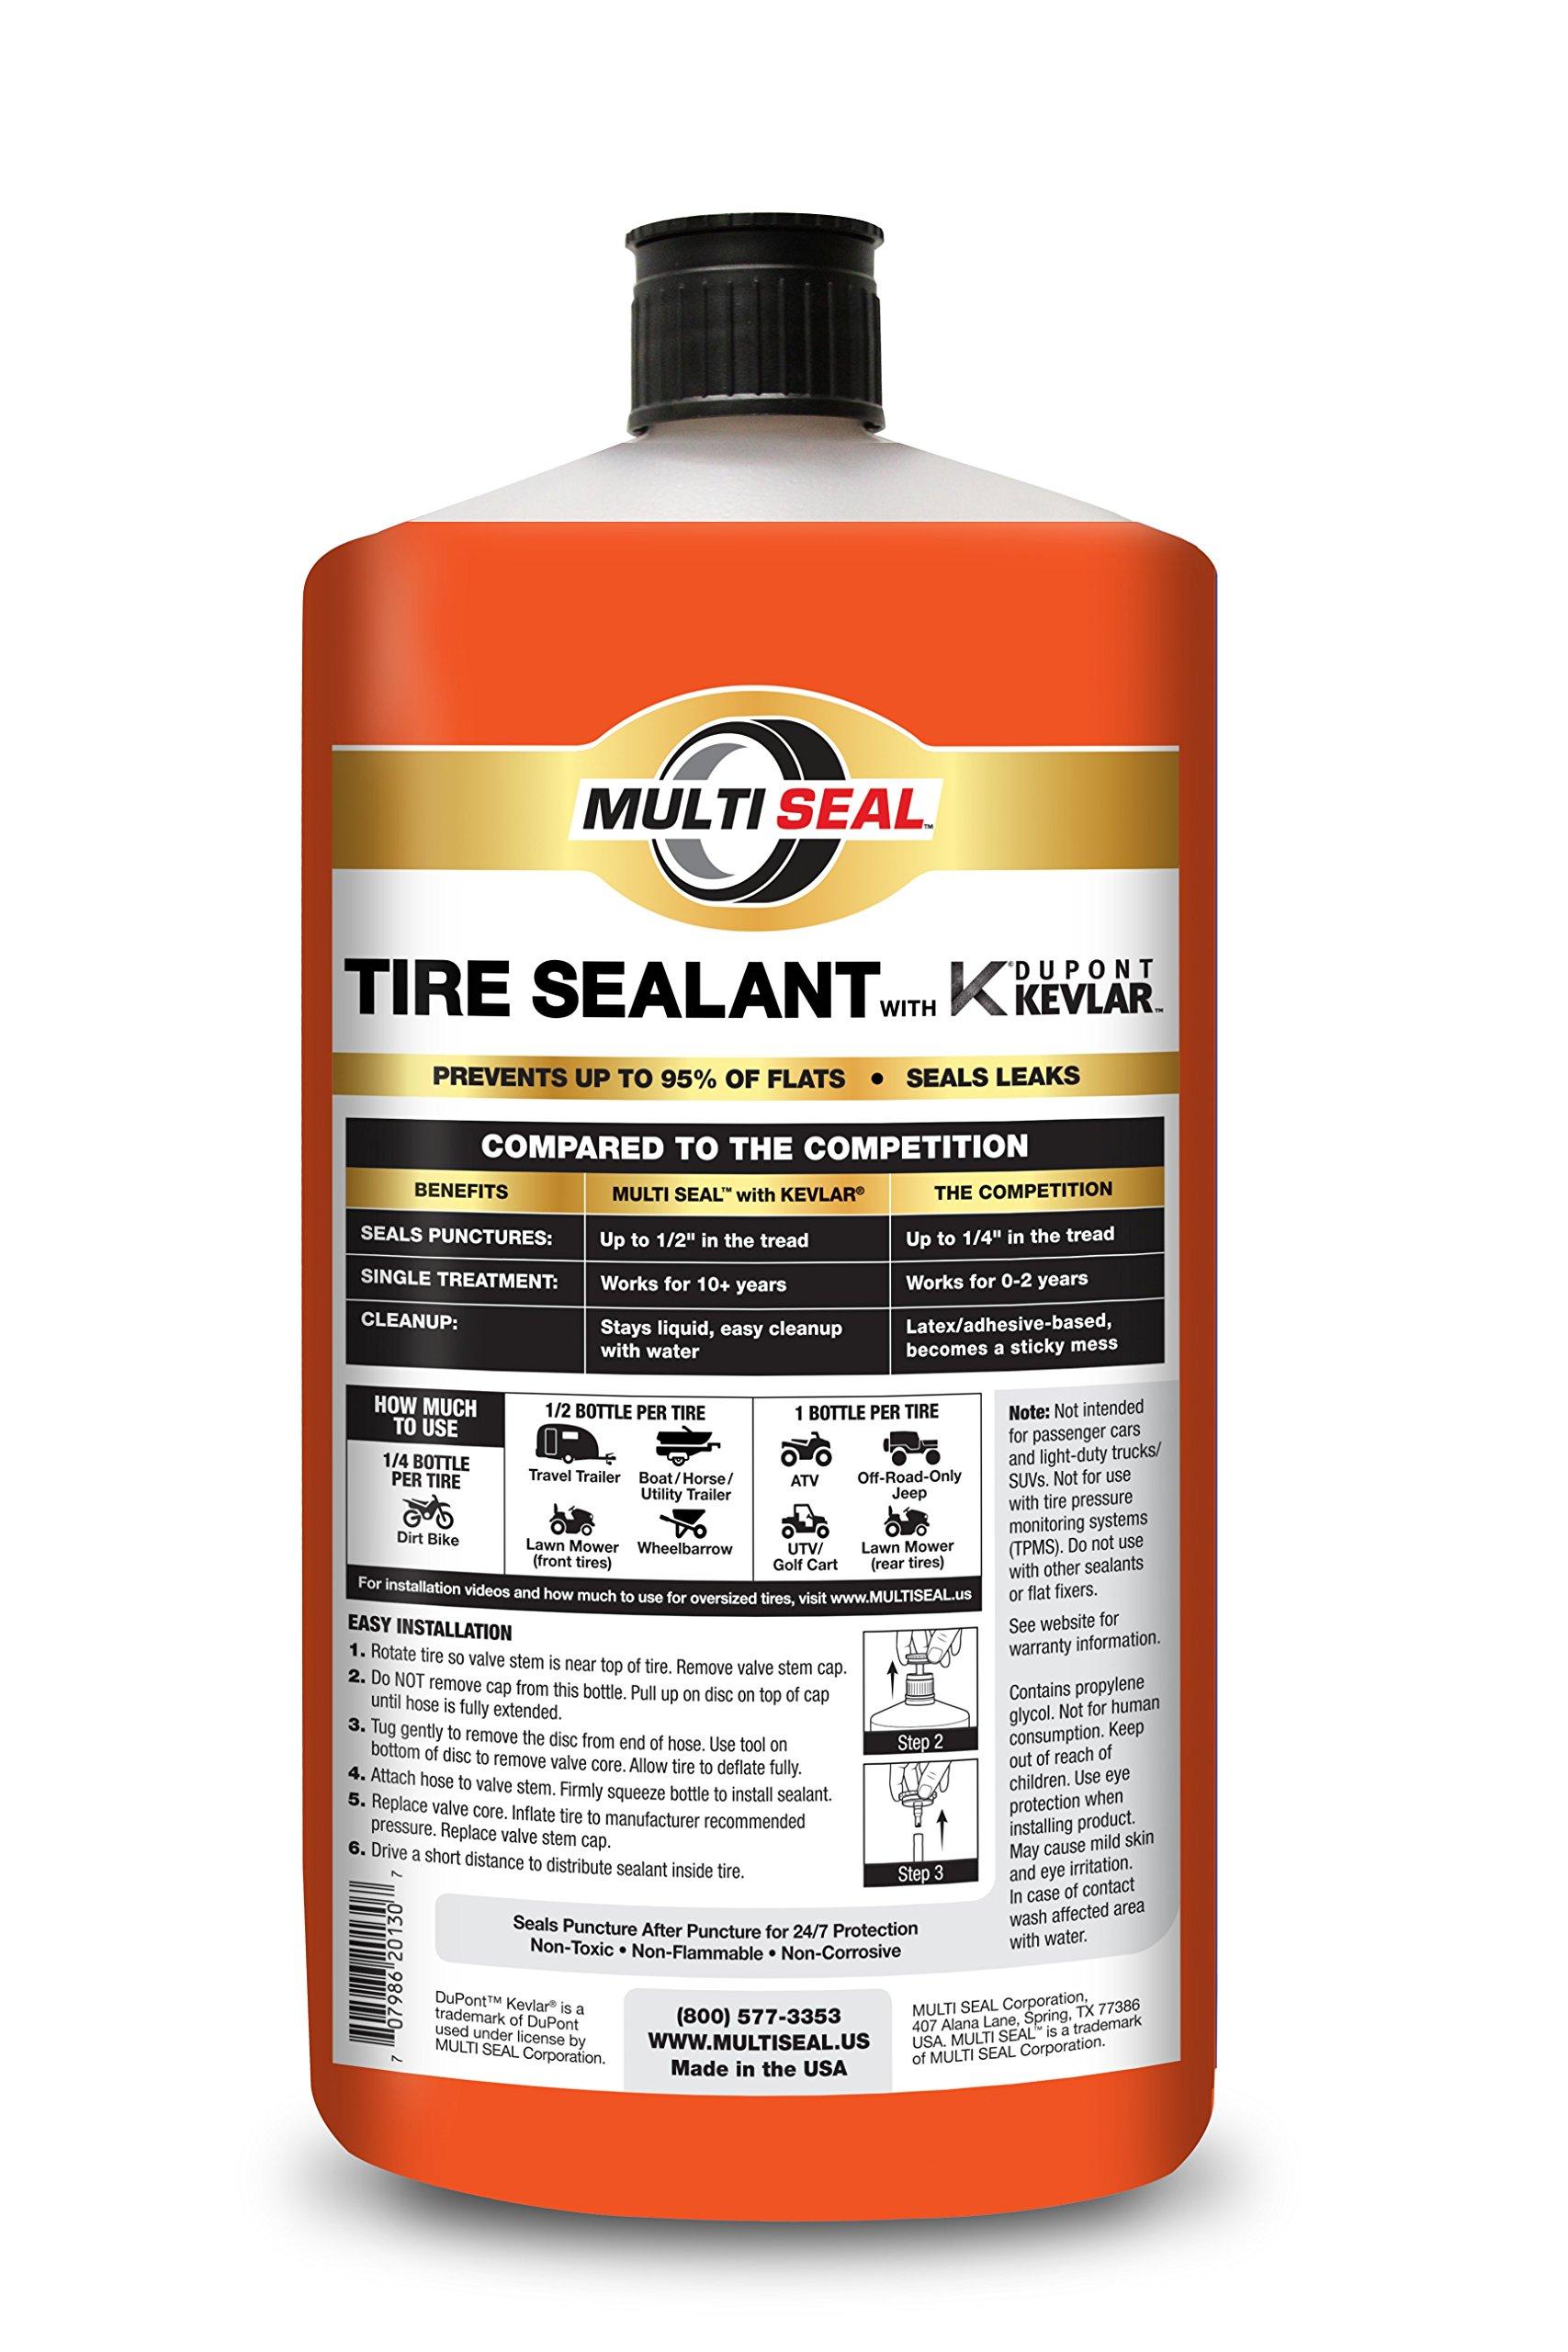 MULTI SEAL Tire Sealant with KEVLAR — Sportsman Formula, 32 fl. oz by MULTI SEAL (Image #2)